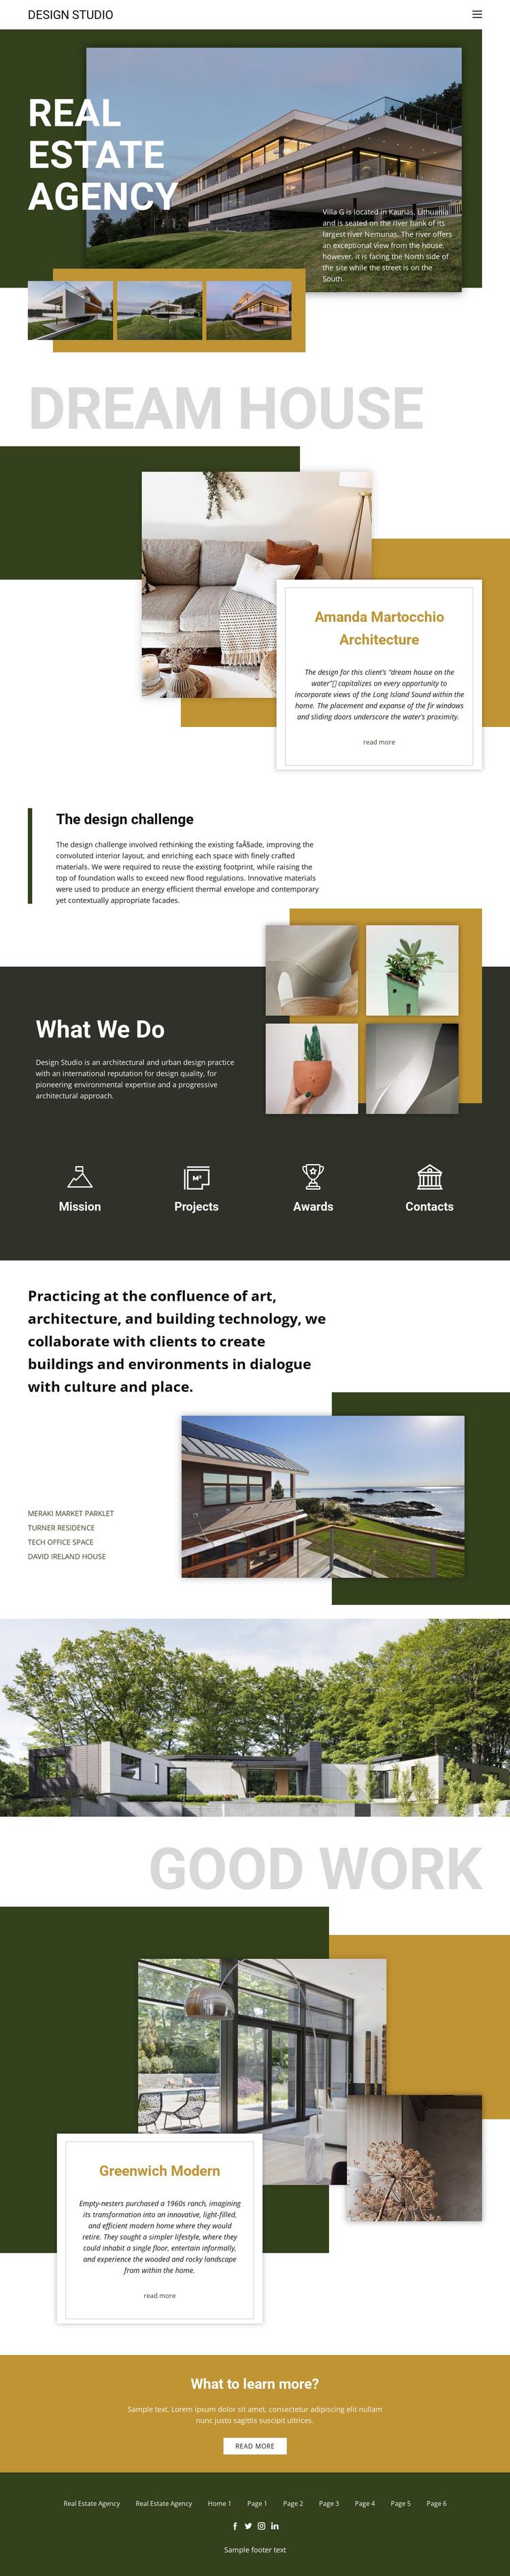 Dream real estate agency Web Design